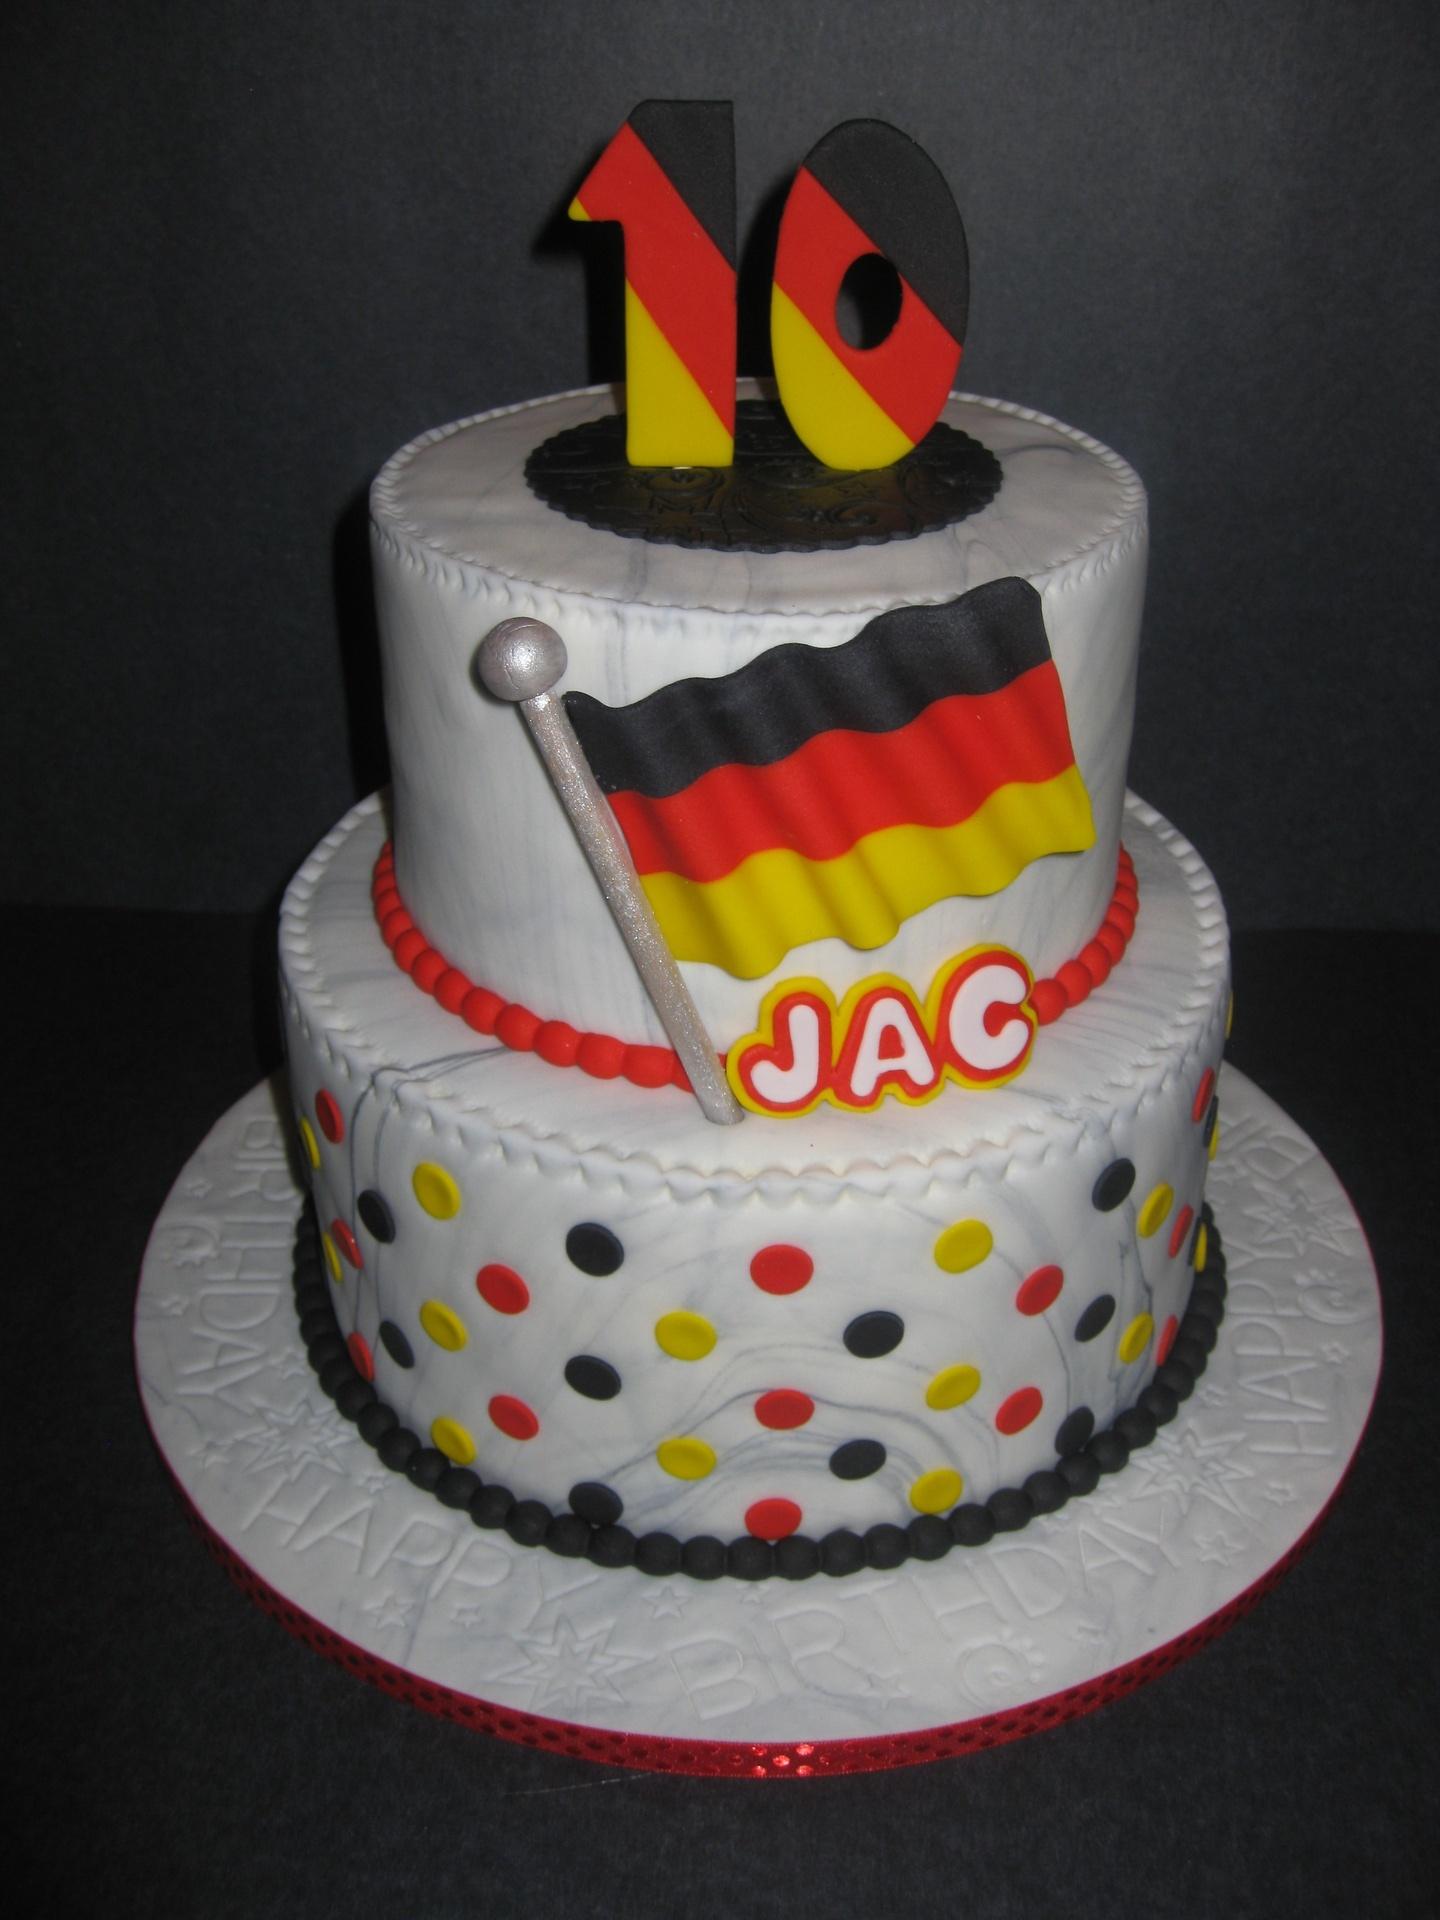 Jac's Germany Themed Birthday